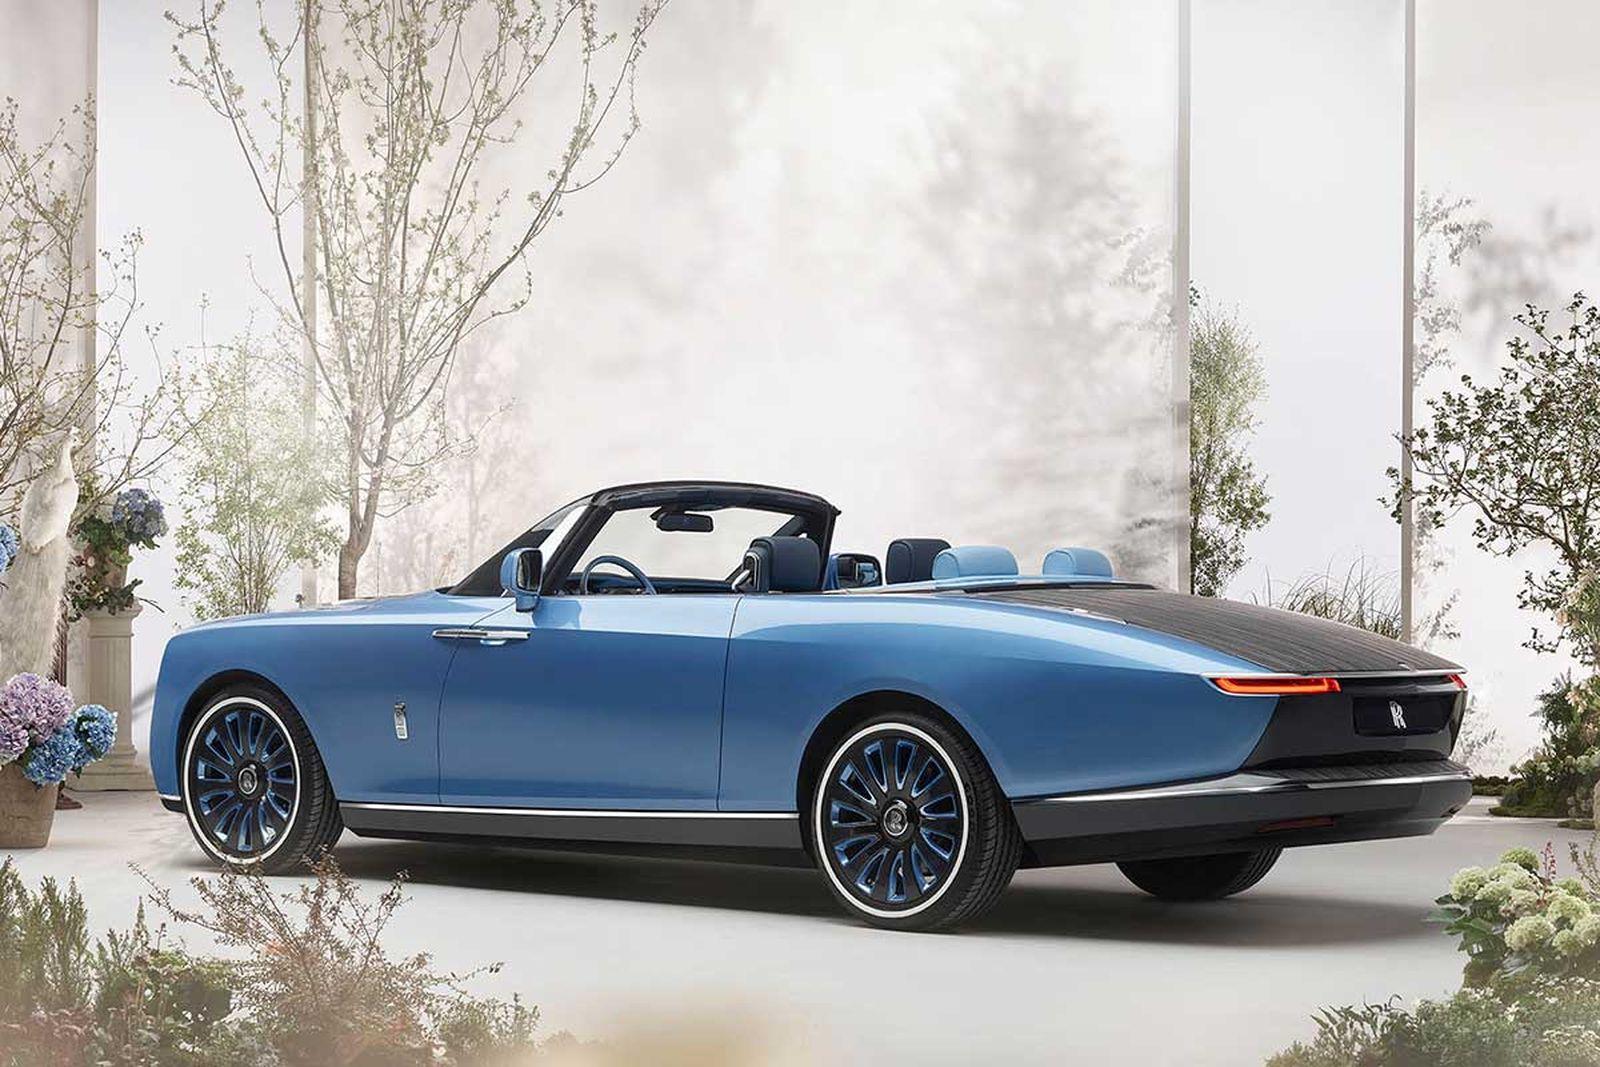 Rolls-Royce-Boat-Tail-coachbuild-car (9)